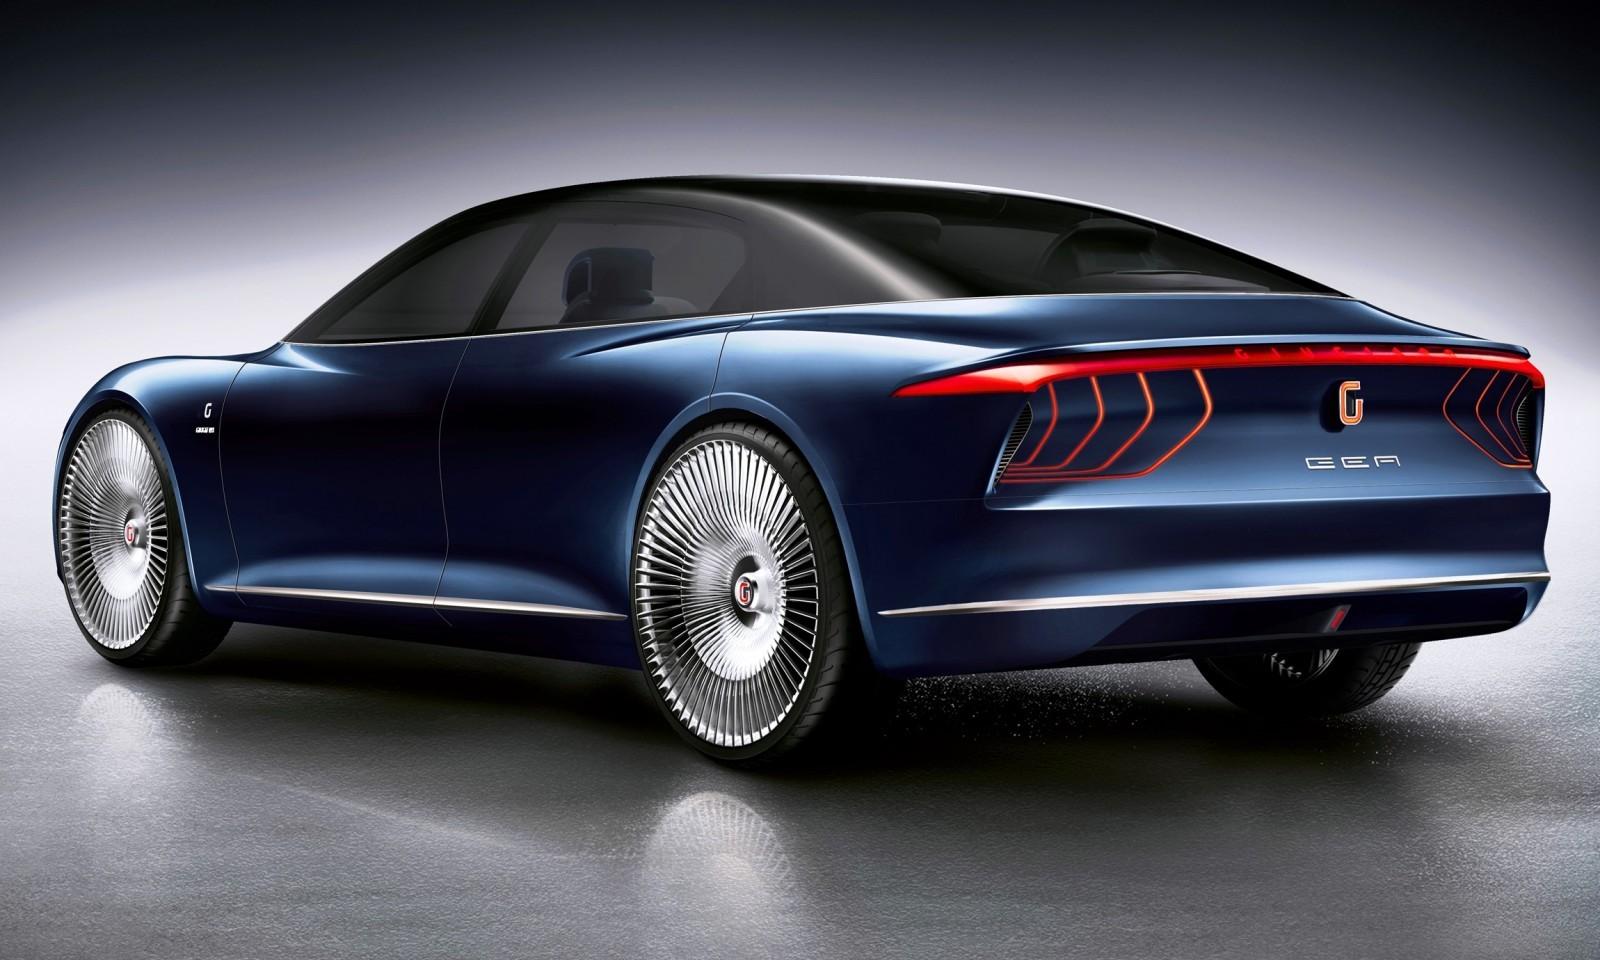 2015 ItalDesign Giugiaro GEA Concept 9